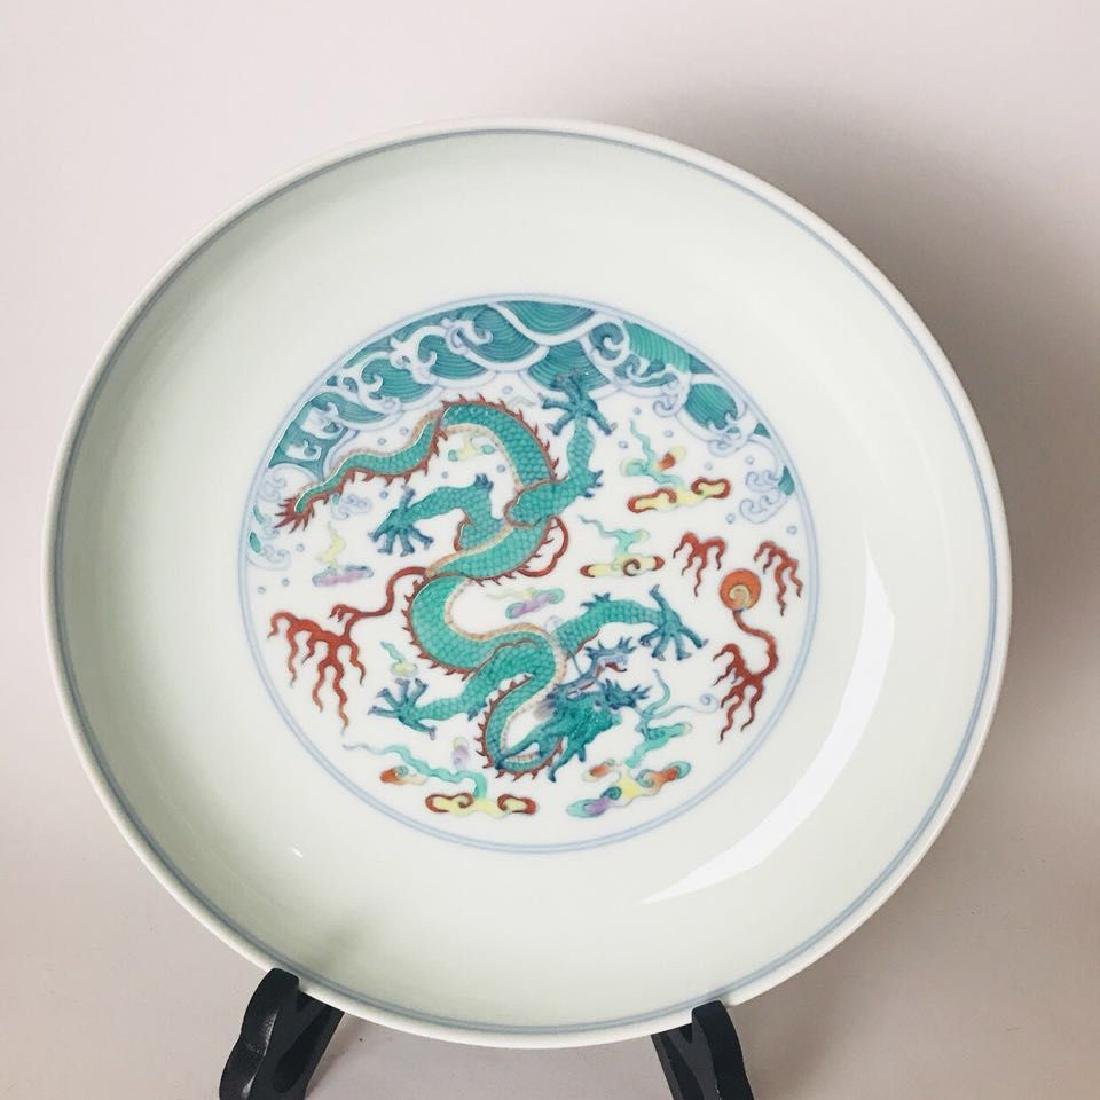 DouCai Porcelain Dragon Plate Mark Da Qing - 2